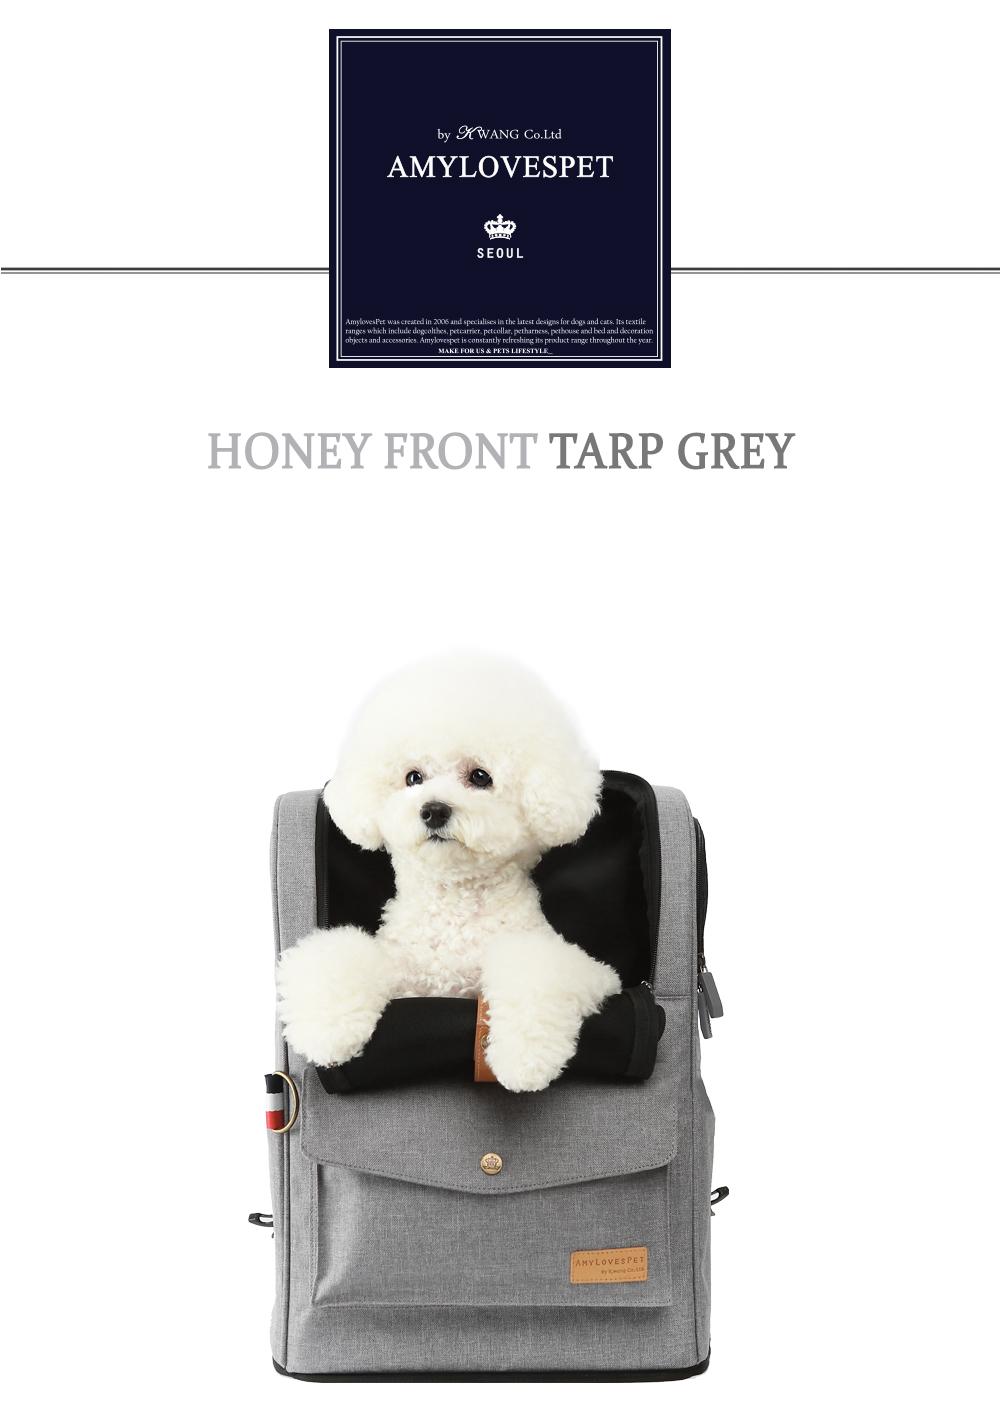 honeyfronttarpgray-detail1.jpg